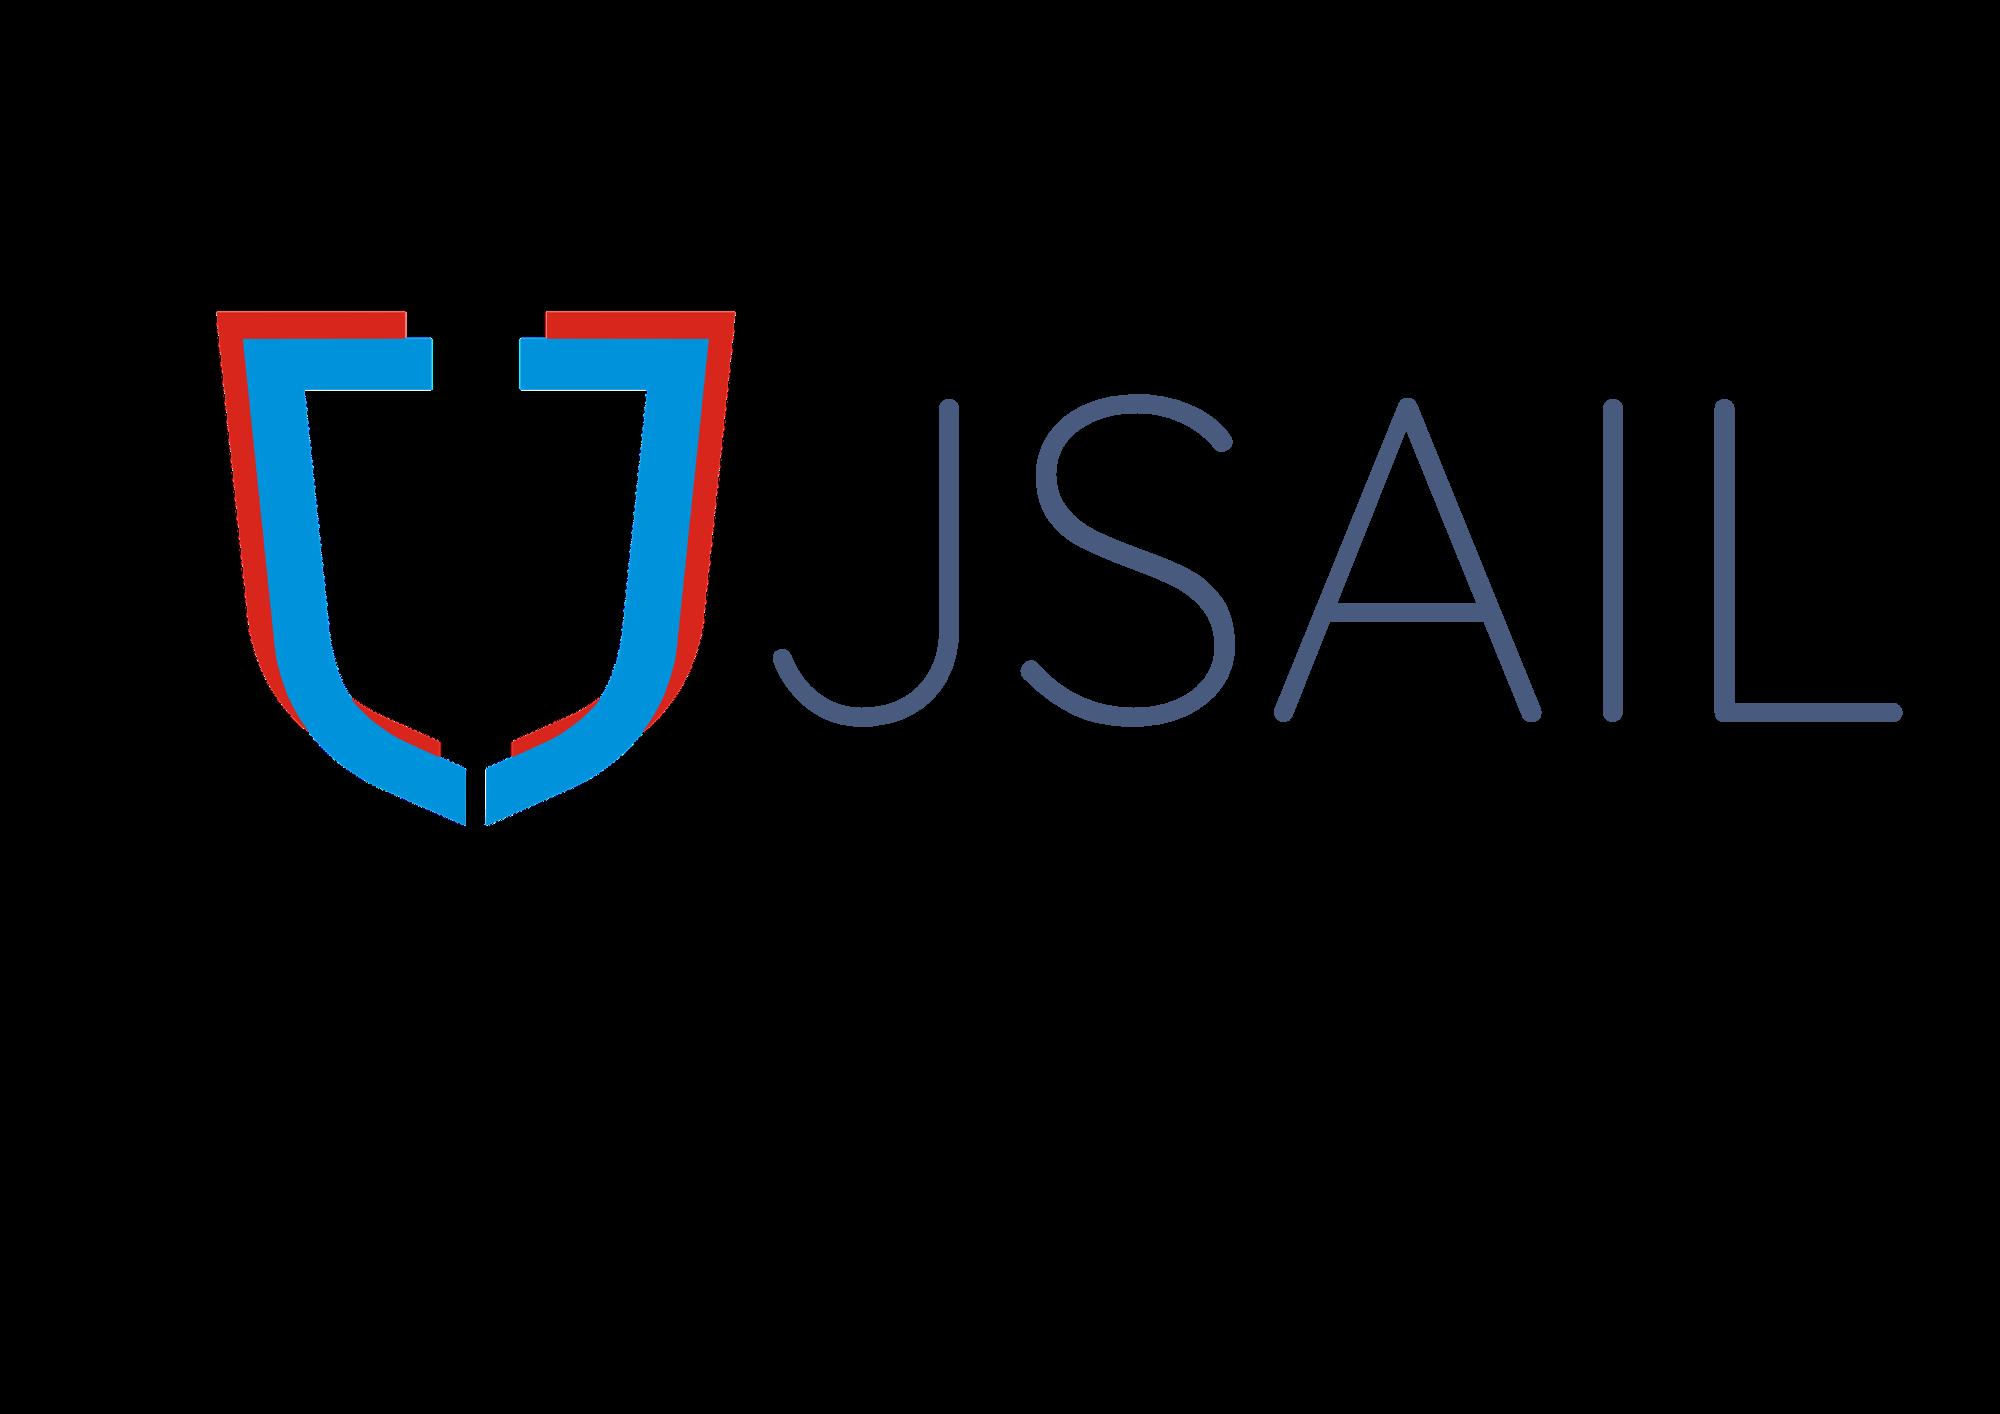 J-Sail